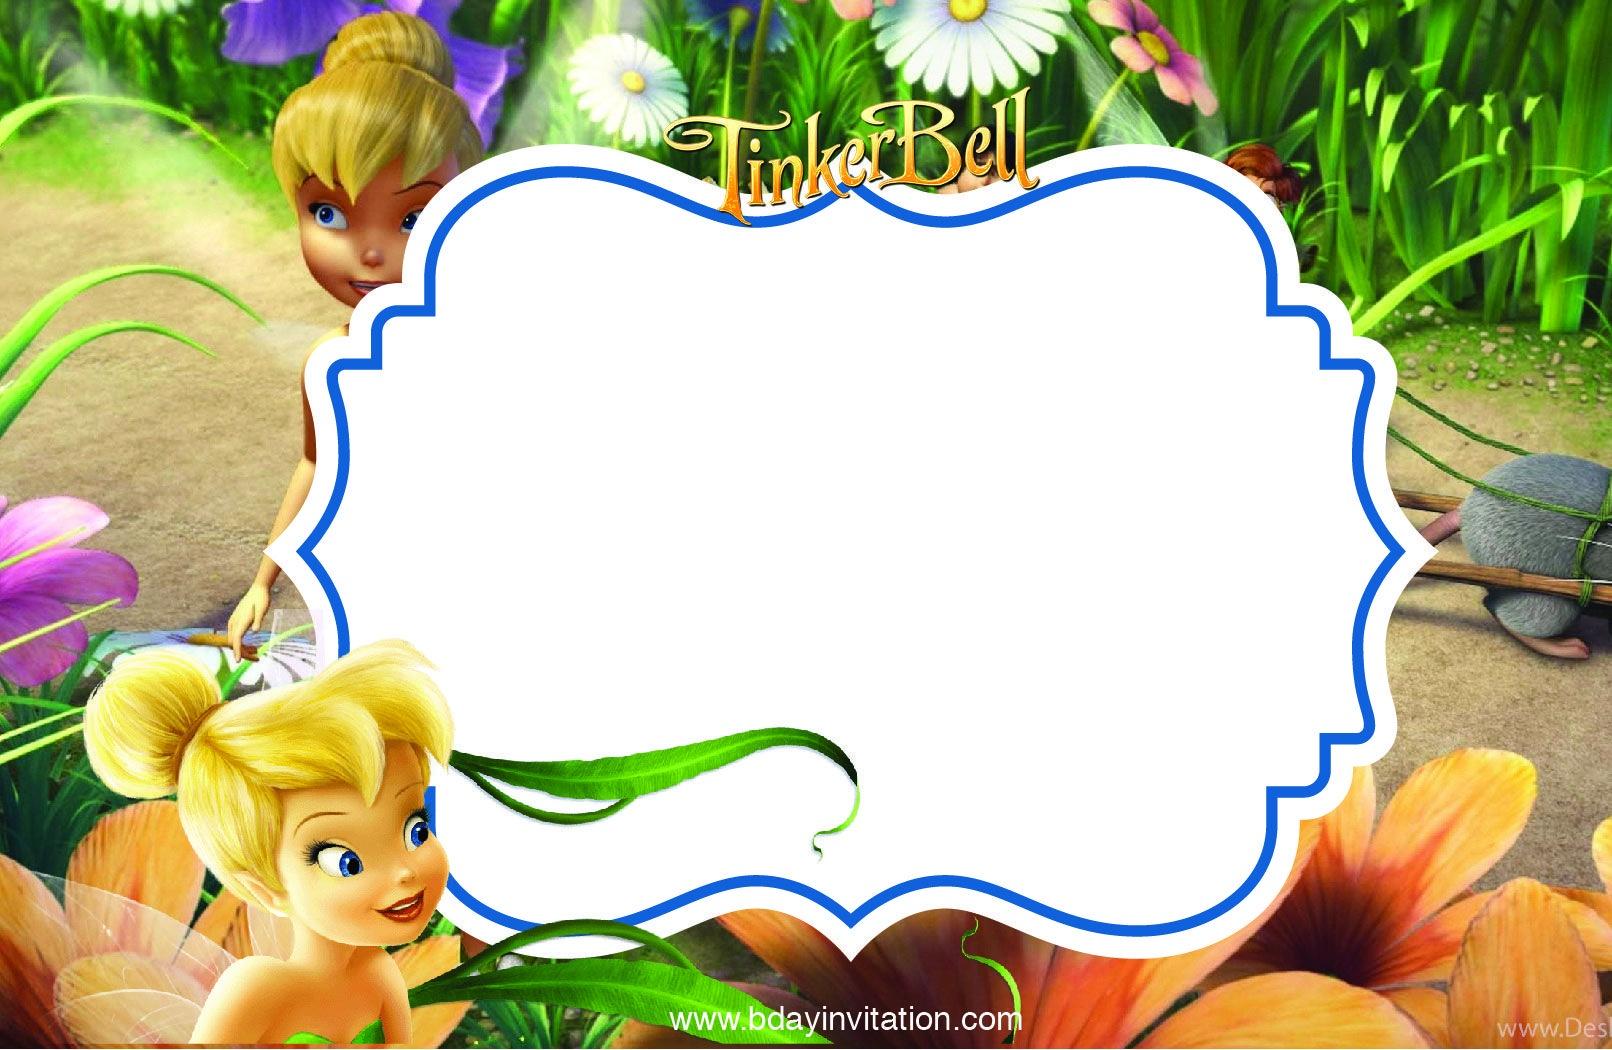 Cool Free Printable Disney Tinkerbell Birthday Invitation Template - Free Tinkerbell Printable Birthday Invitations